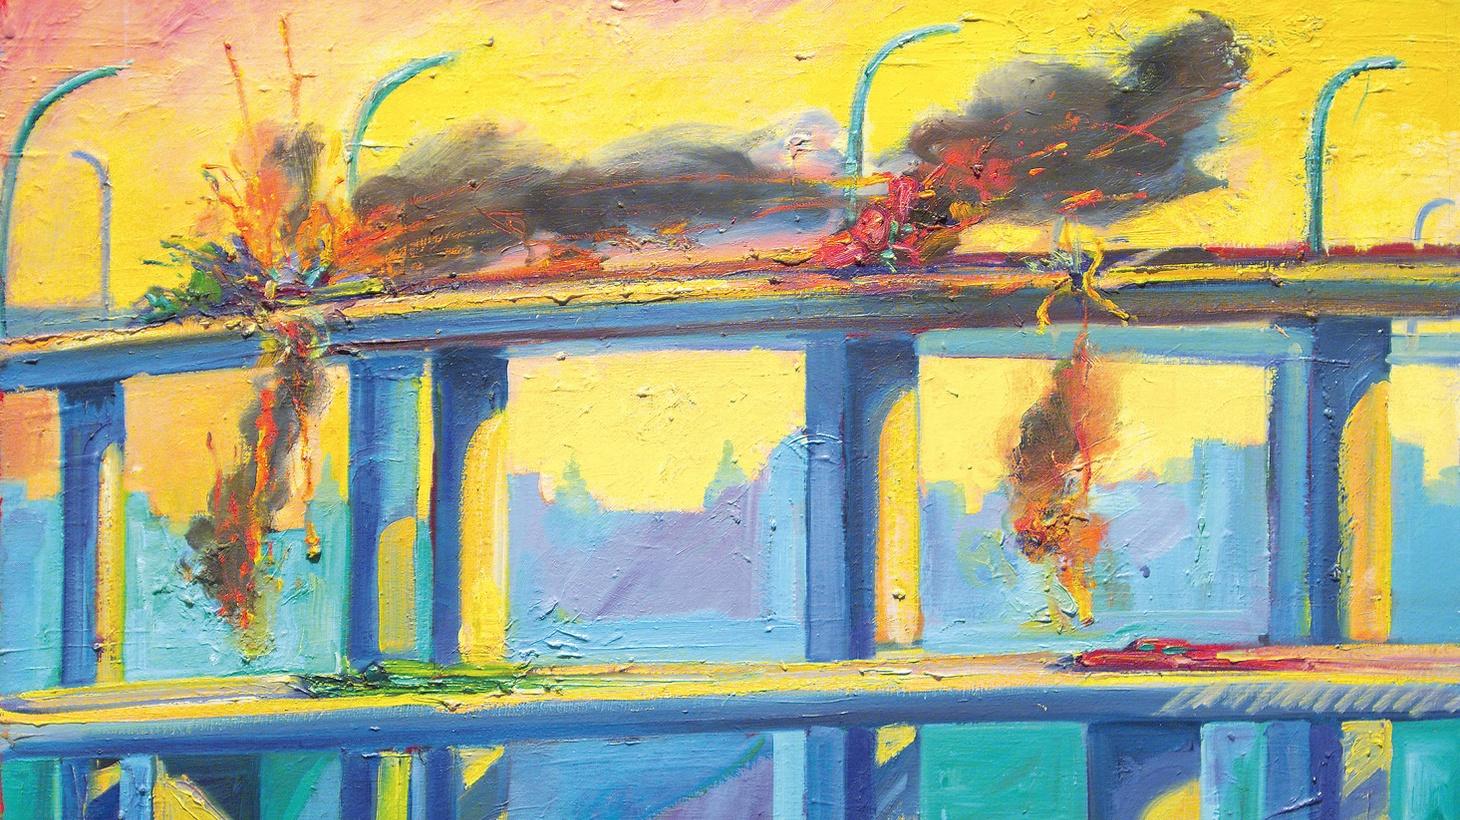 Hunter Drohojowska-Philp talks about exploding cars and dangerous border crossings.